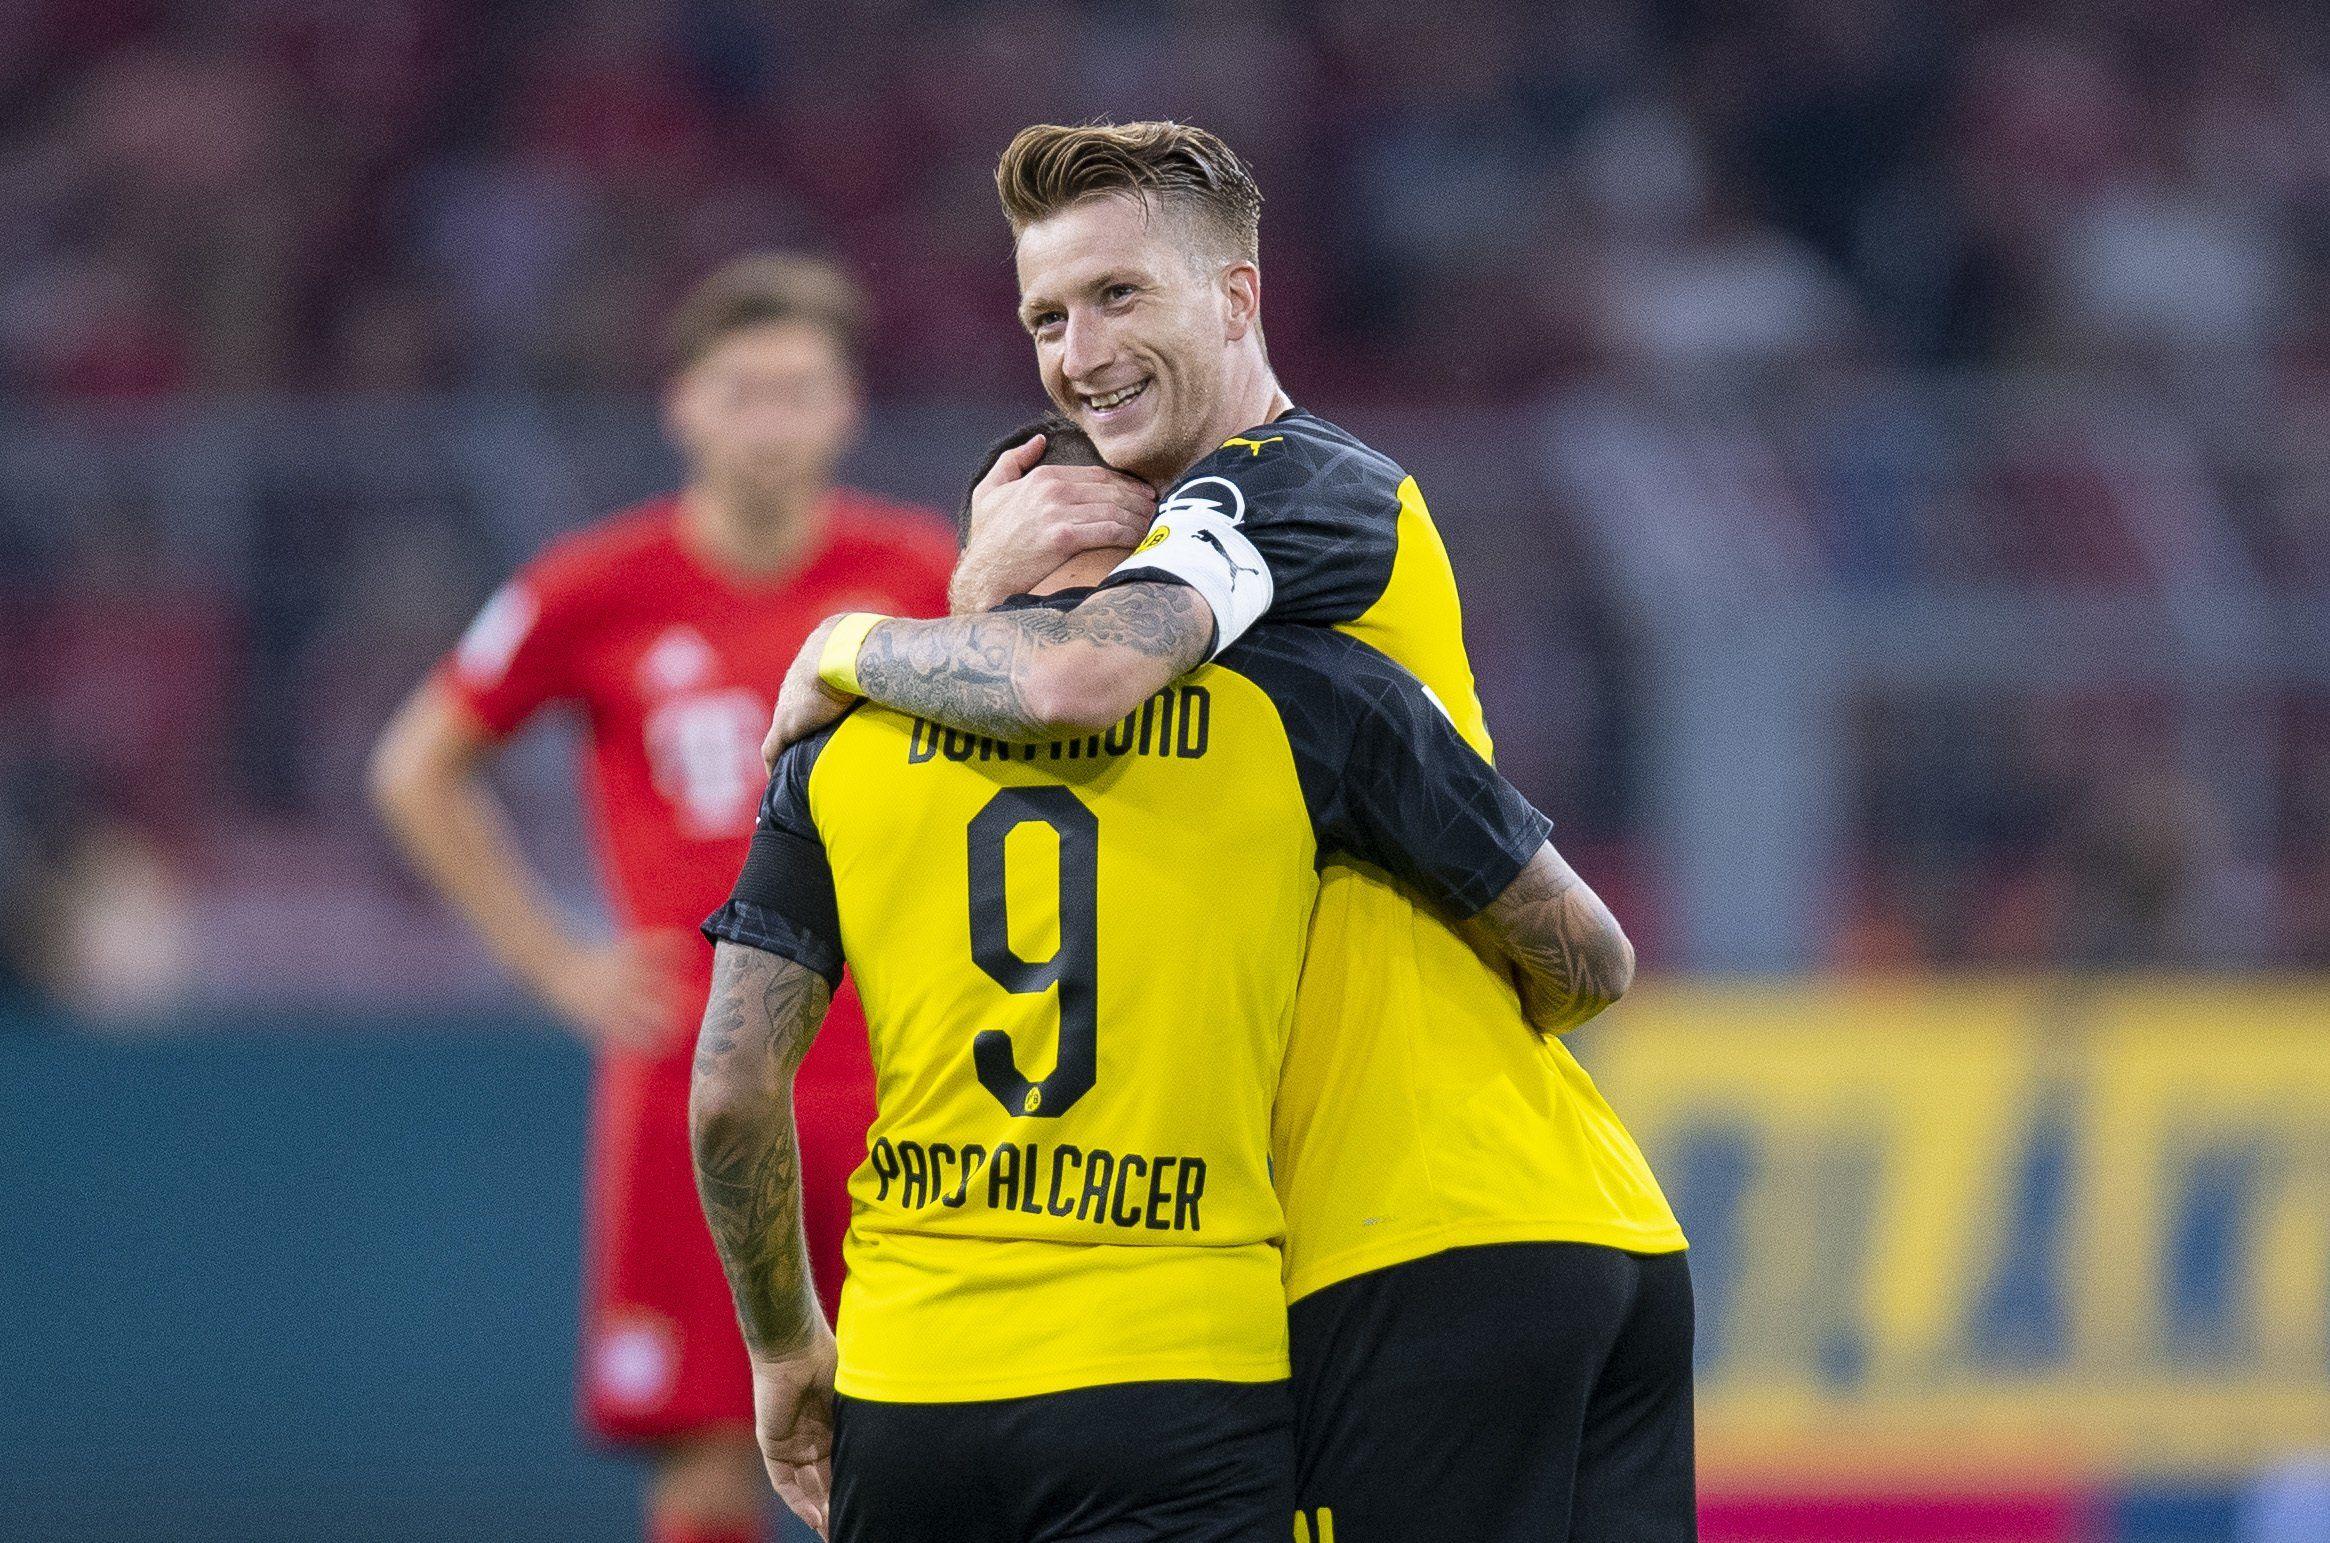 2019 Supercup Champion Bvb 2 0 Fcb Borussia Dortmund Dortmund Bvb